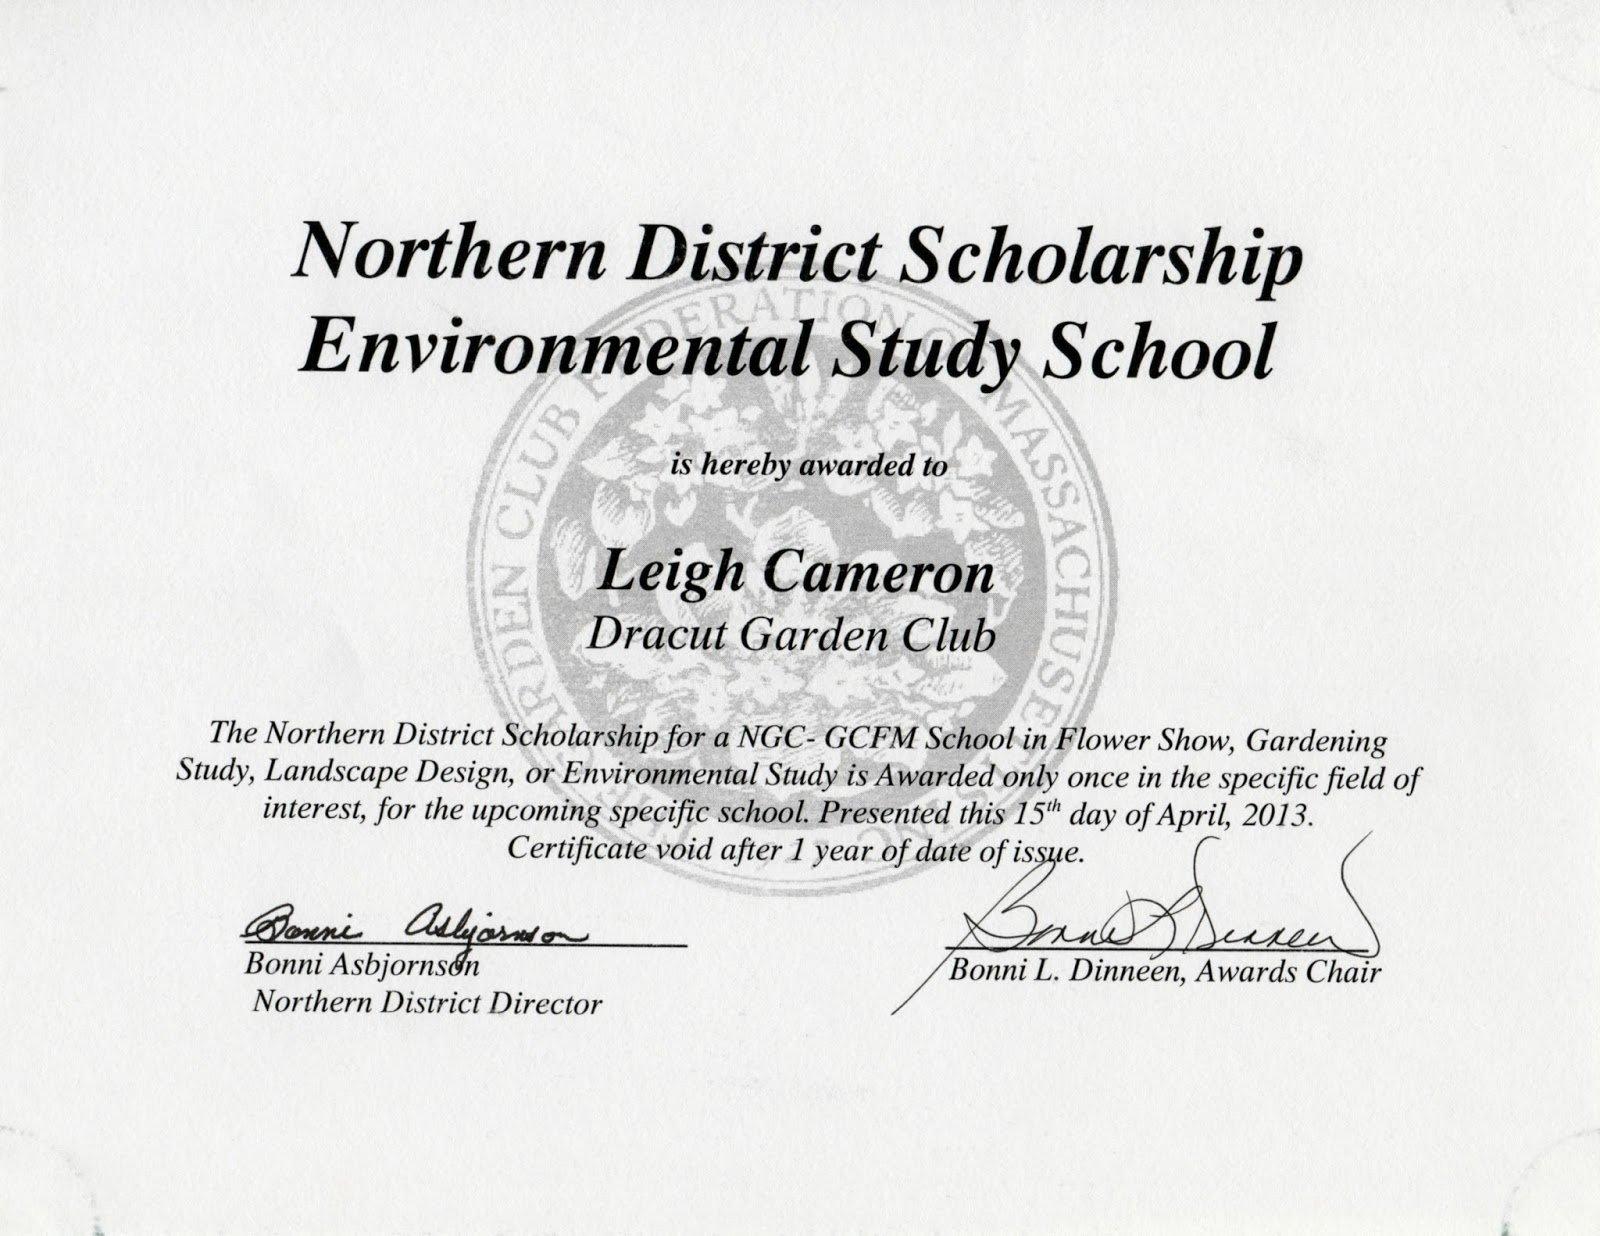 Printable Certificate Of Scholarship Award